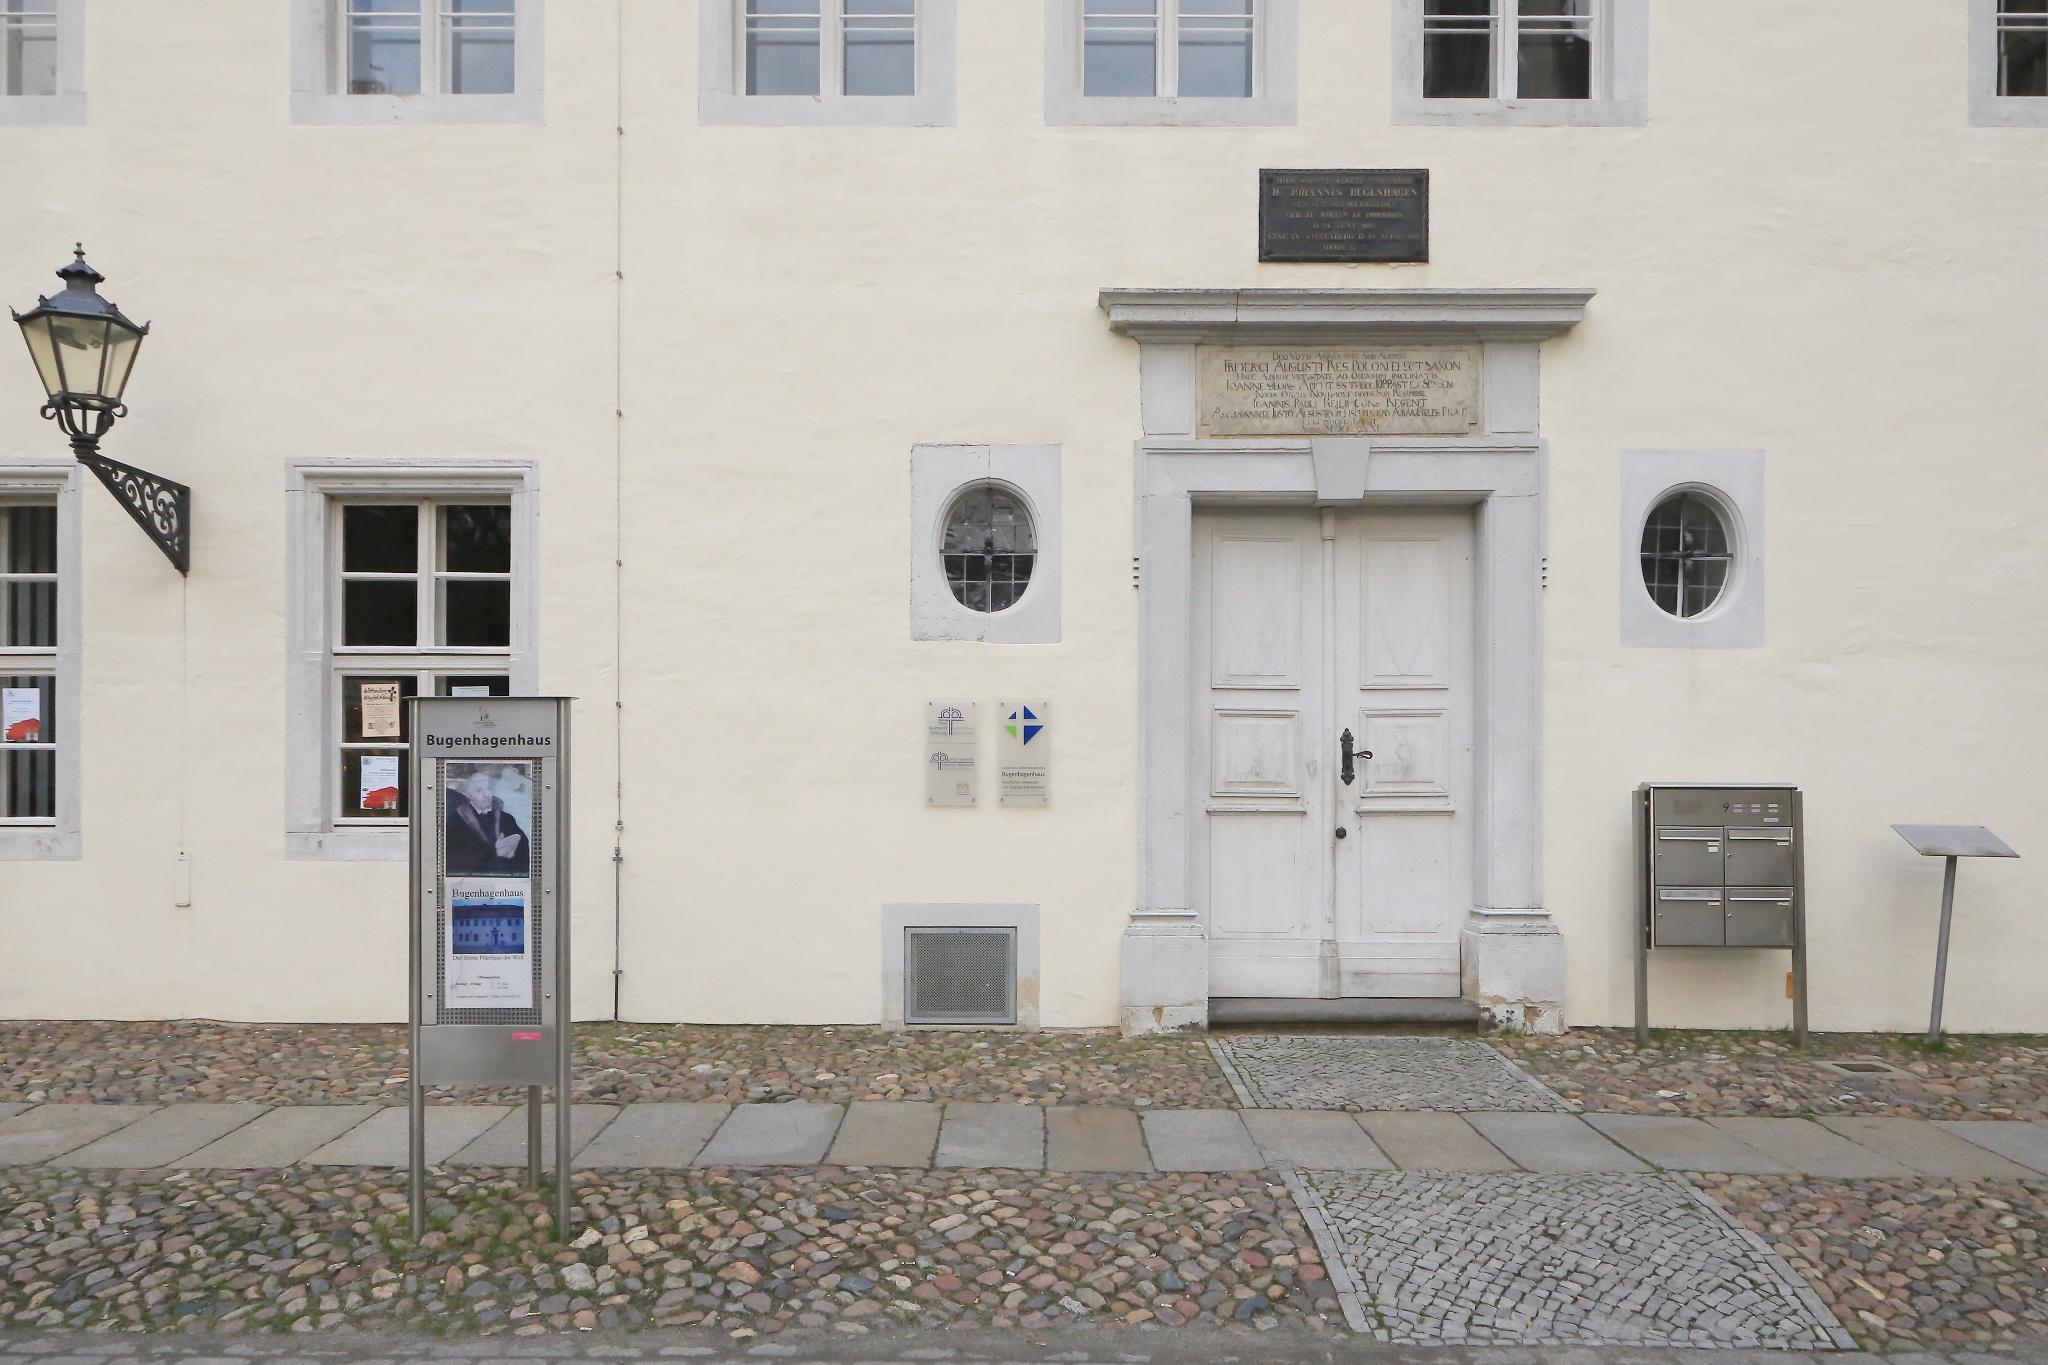 Johannes Bugenhagen Doktor Pomeranus Lutherstadt Wittenberg Wittenberg Saxony-Anhalt Sachsen & Lutherstadt Wittenberg: townu0027s 13 historical highlights